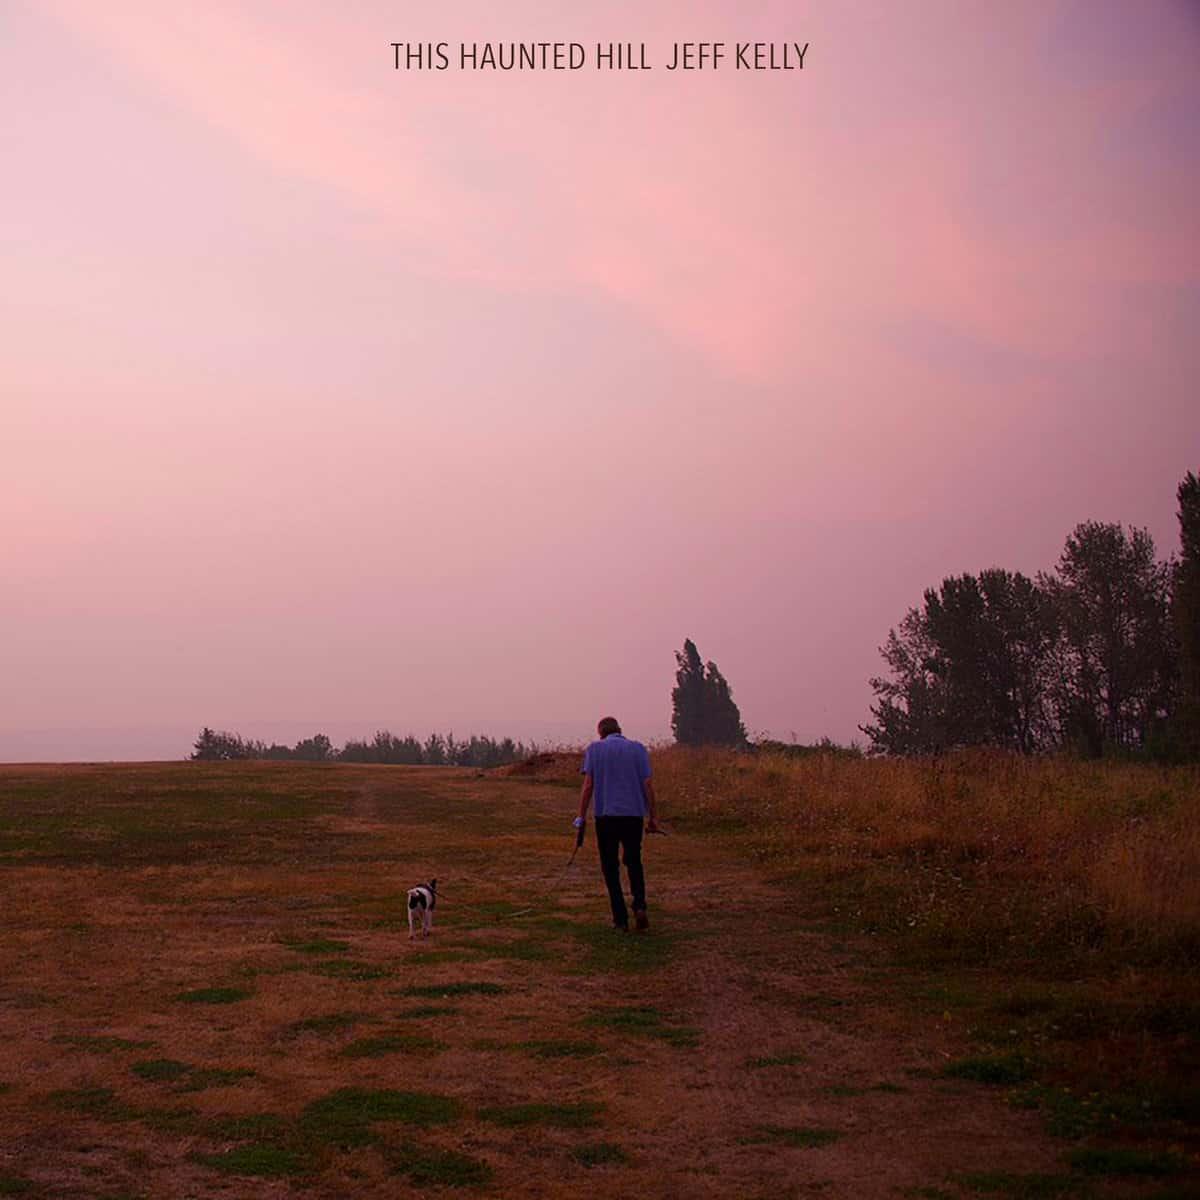 Jeff Kelly - Haunted Hill